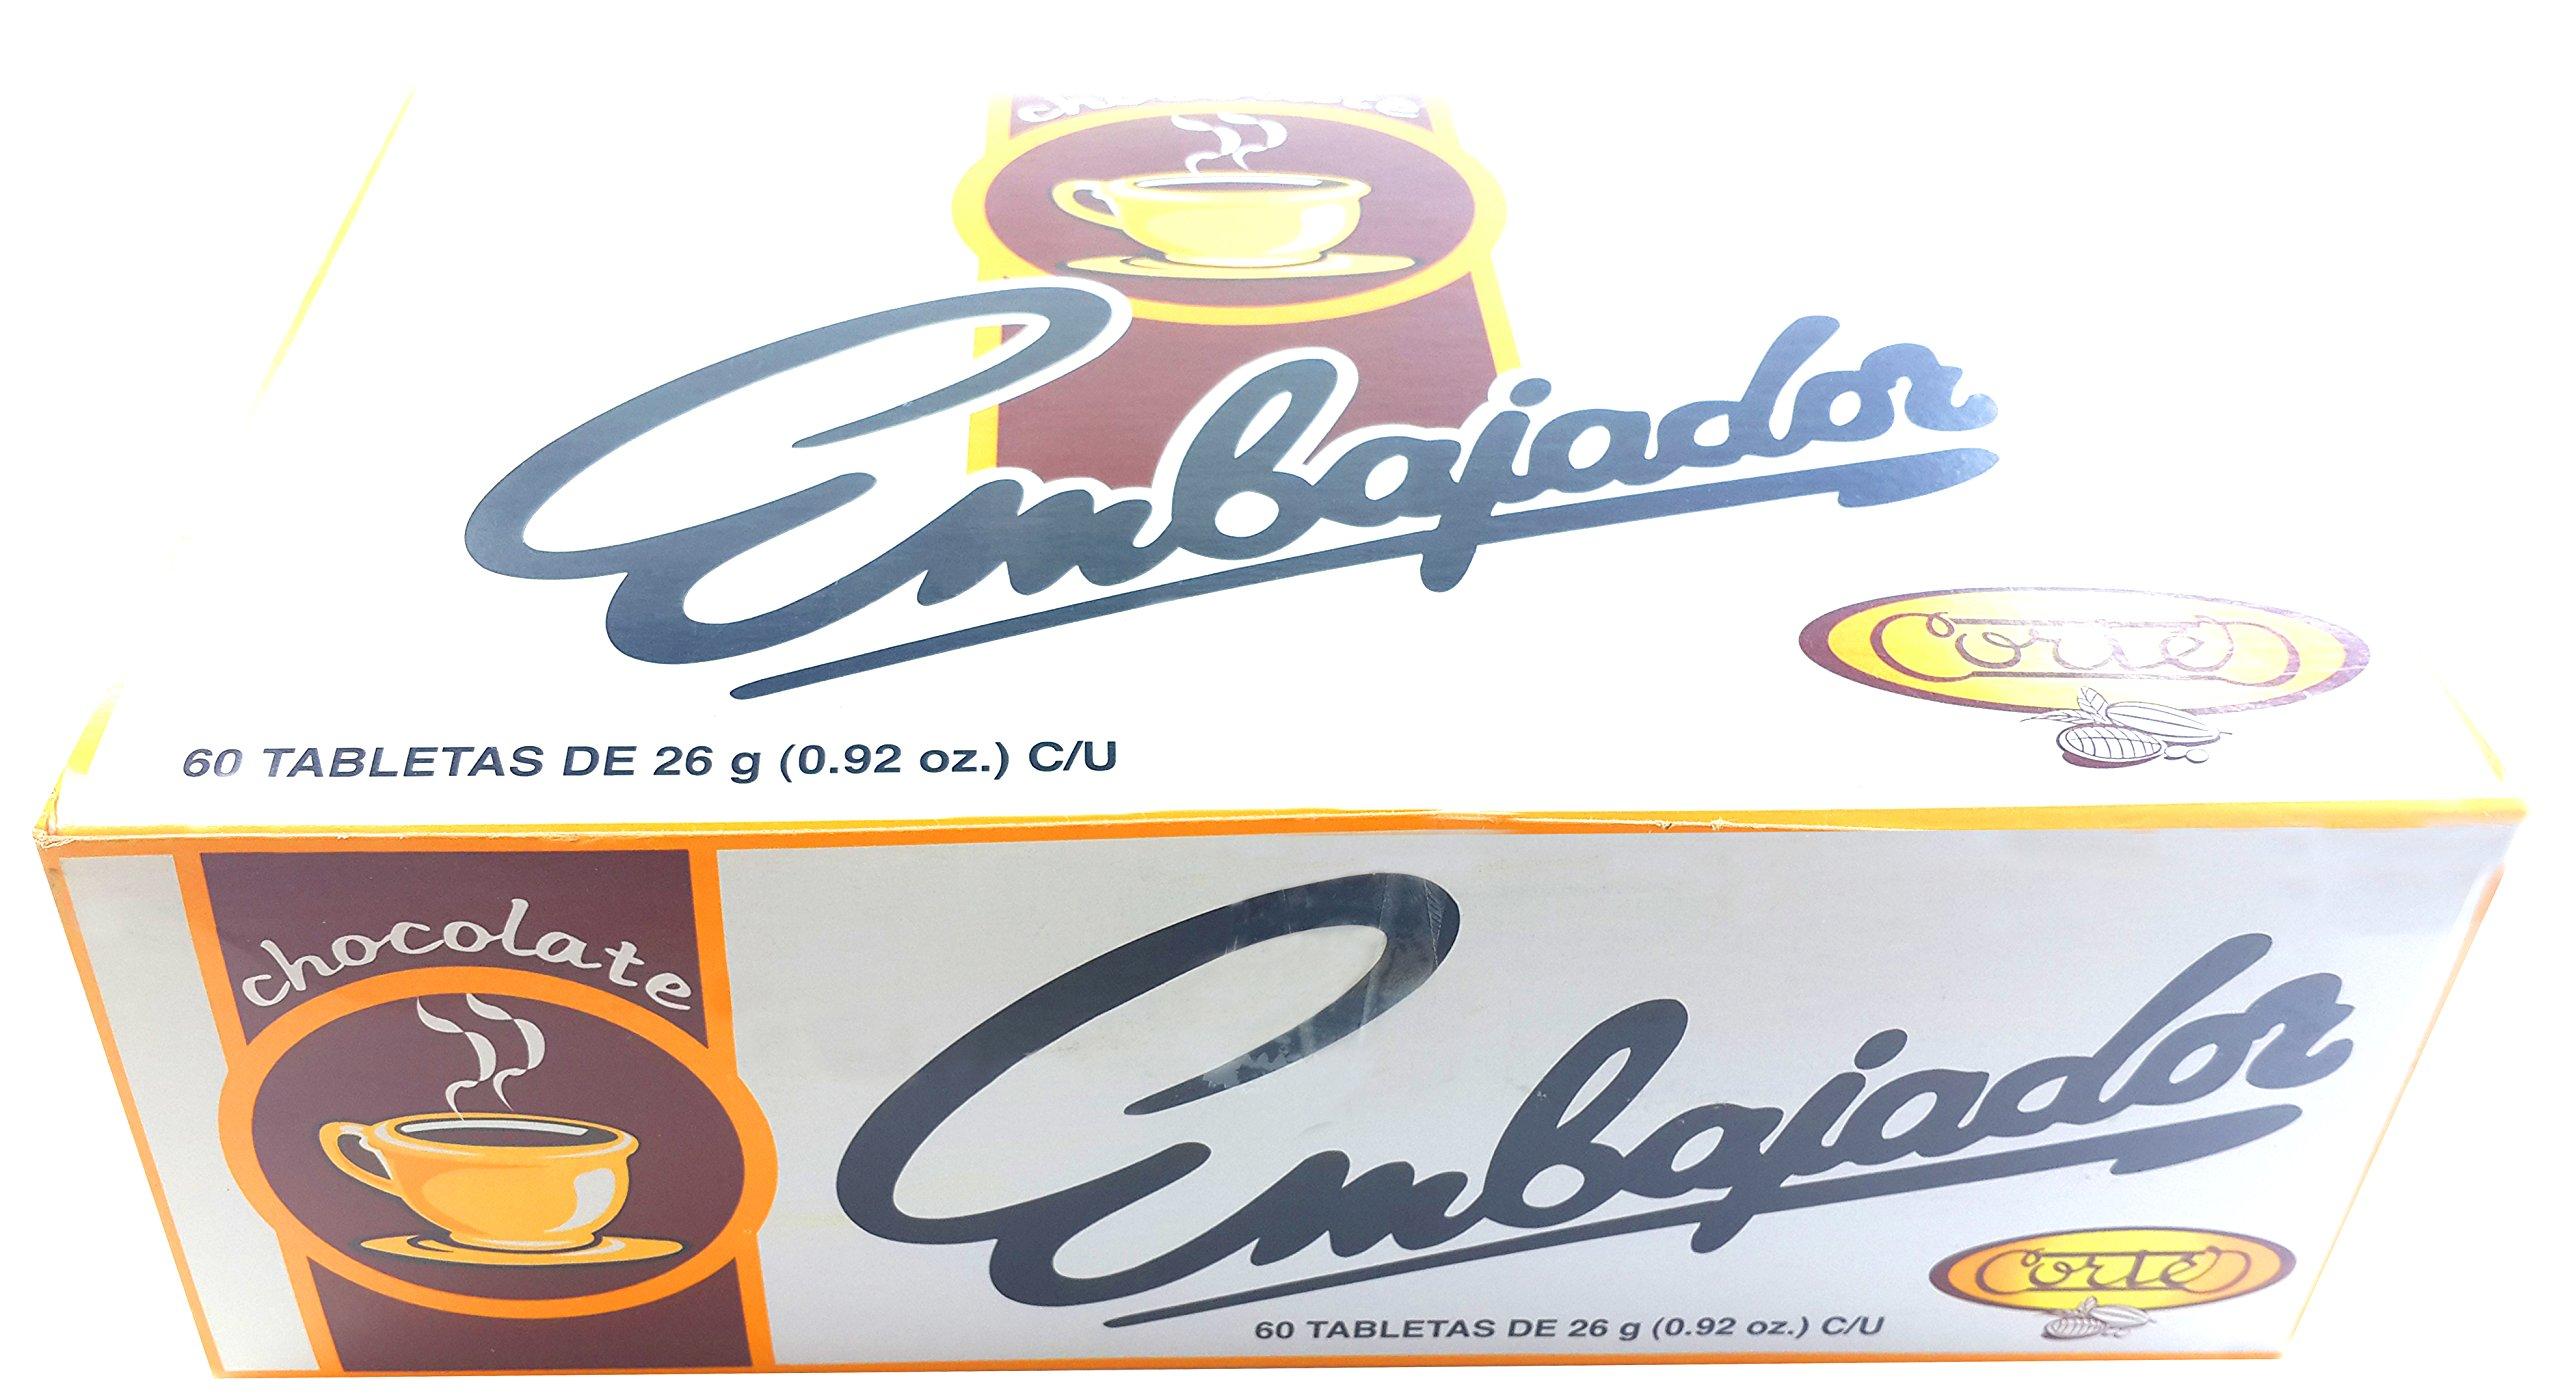 Sweet Dominican Chocolate Embajador Box of 60 Bars / Tablets by Chocolate Embajador